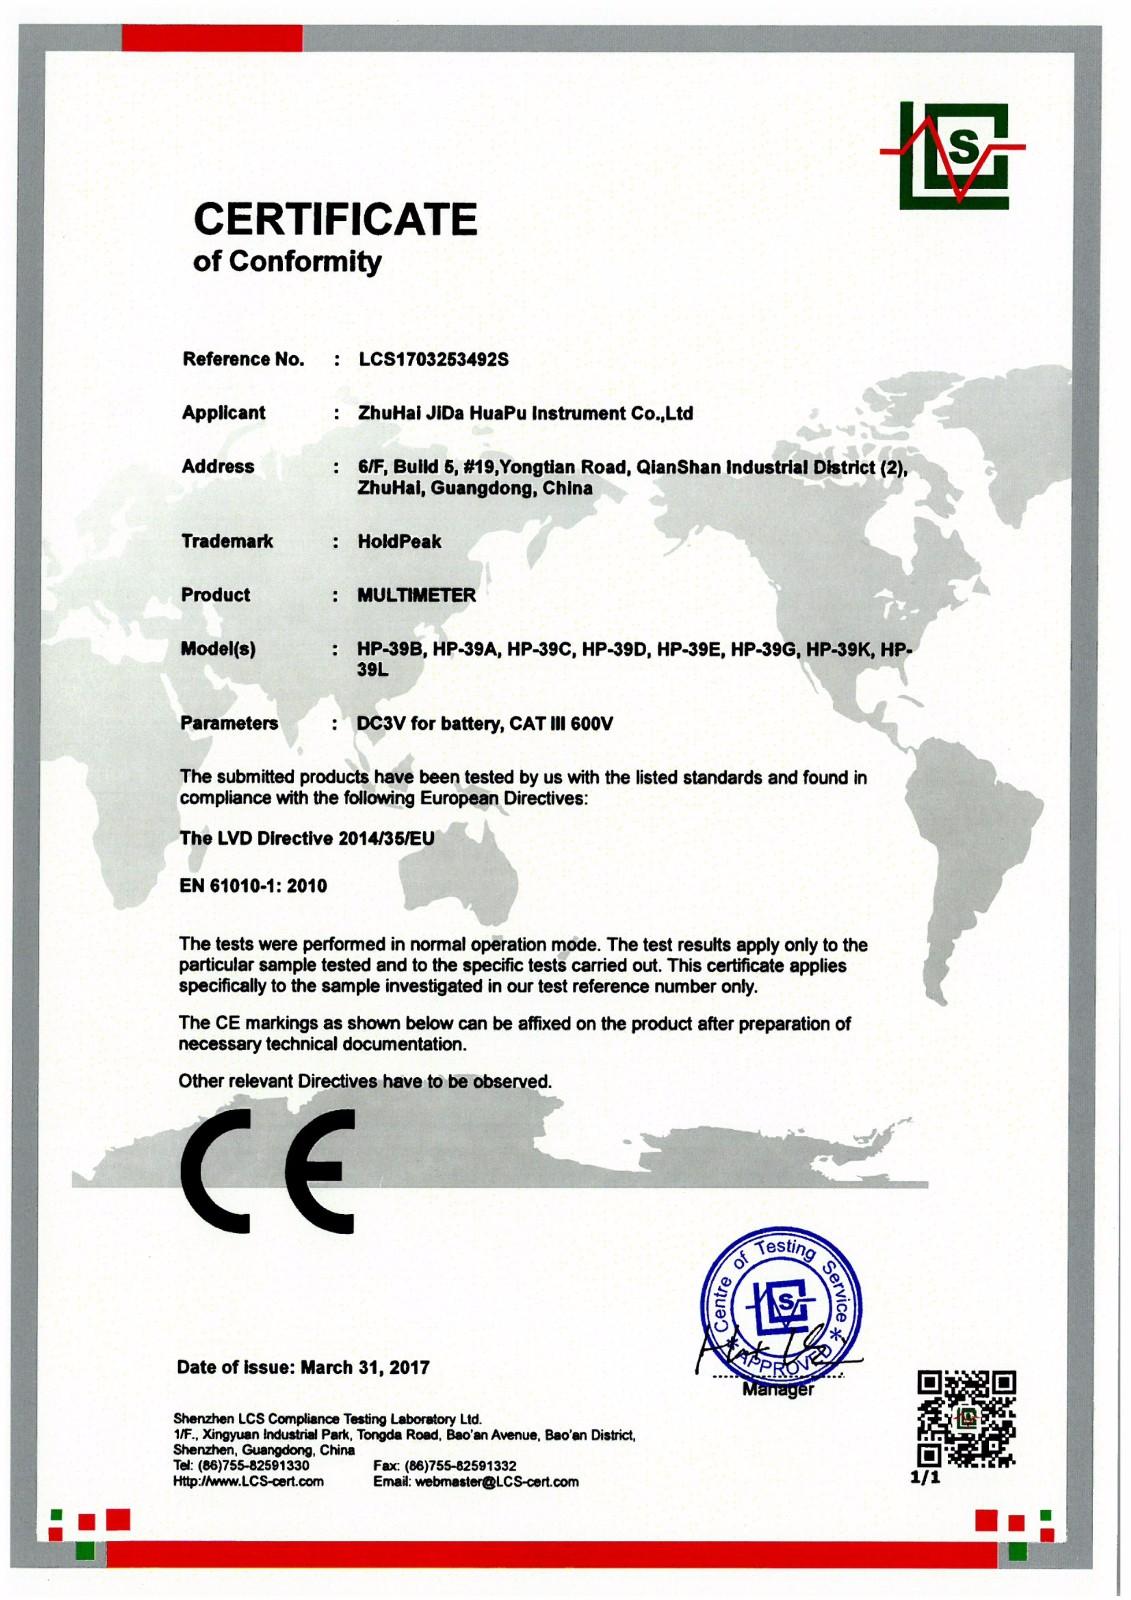 product-HoldPeak-auto range multimeterresistancediode test,continuity buzzer,data hold,HP-39B-img-1